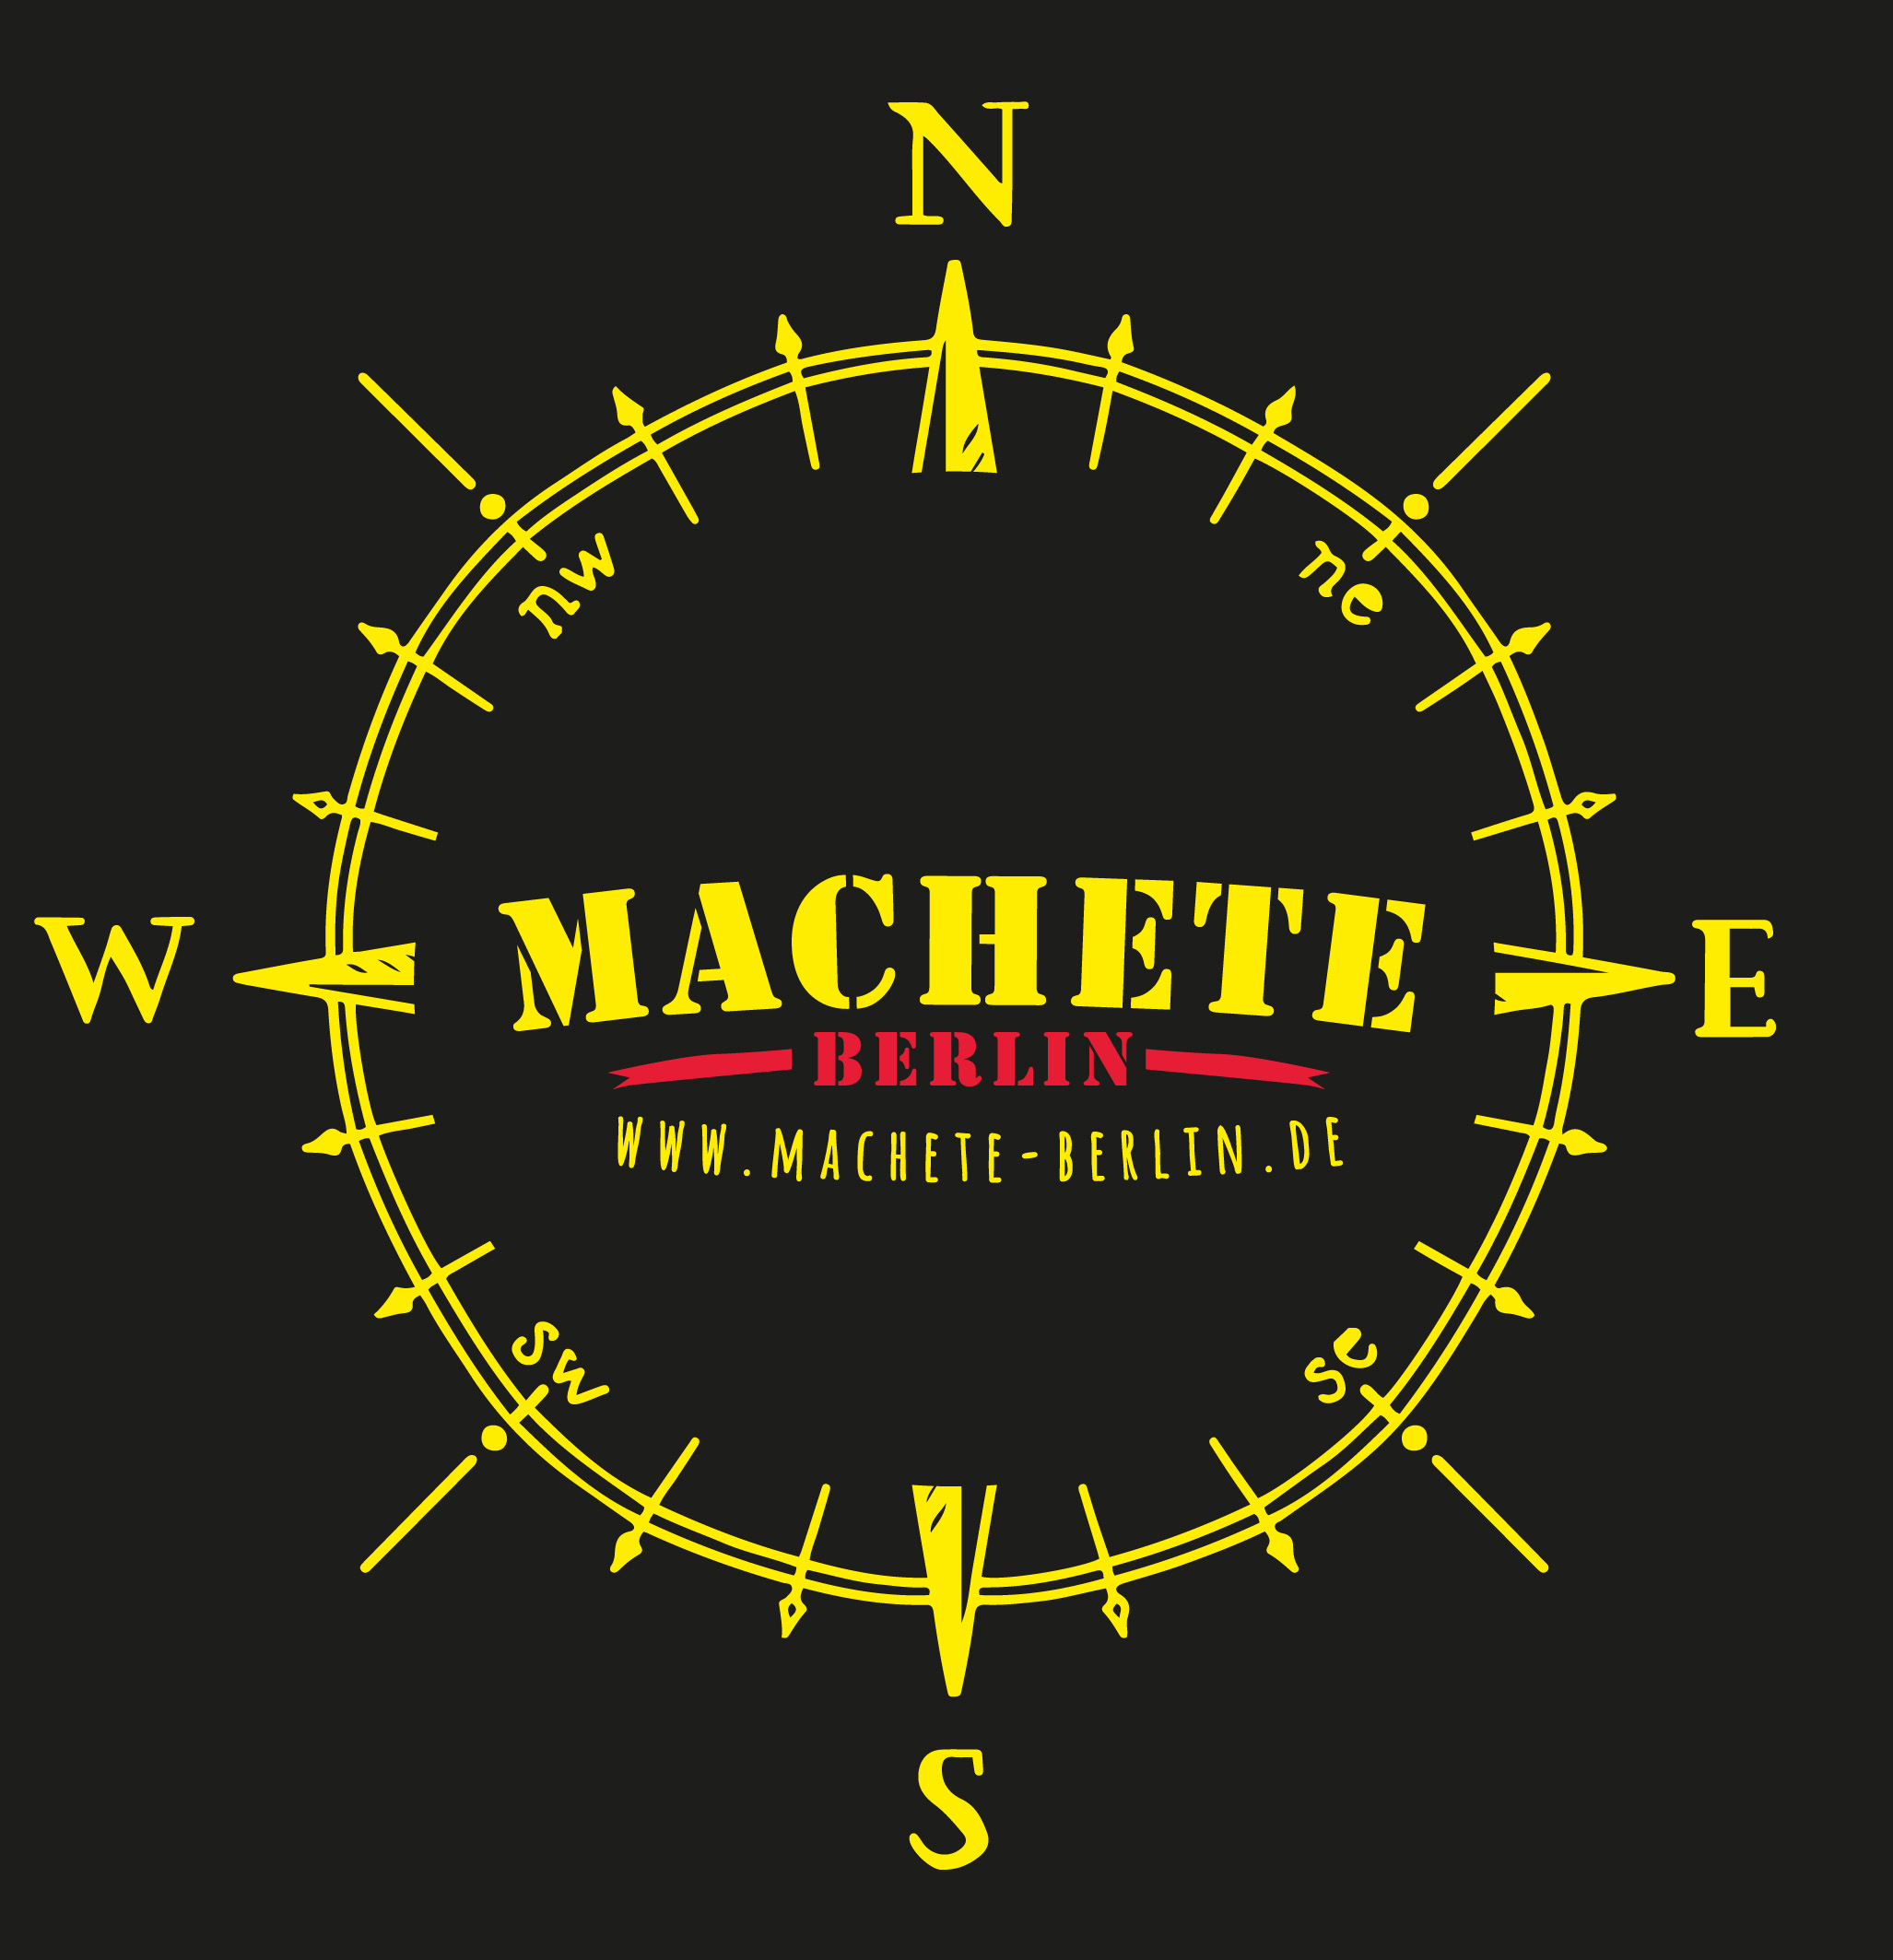 Machete Berlin